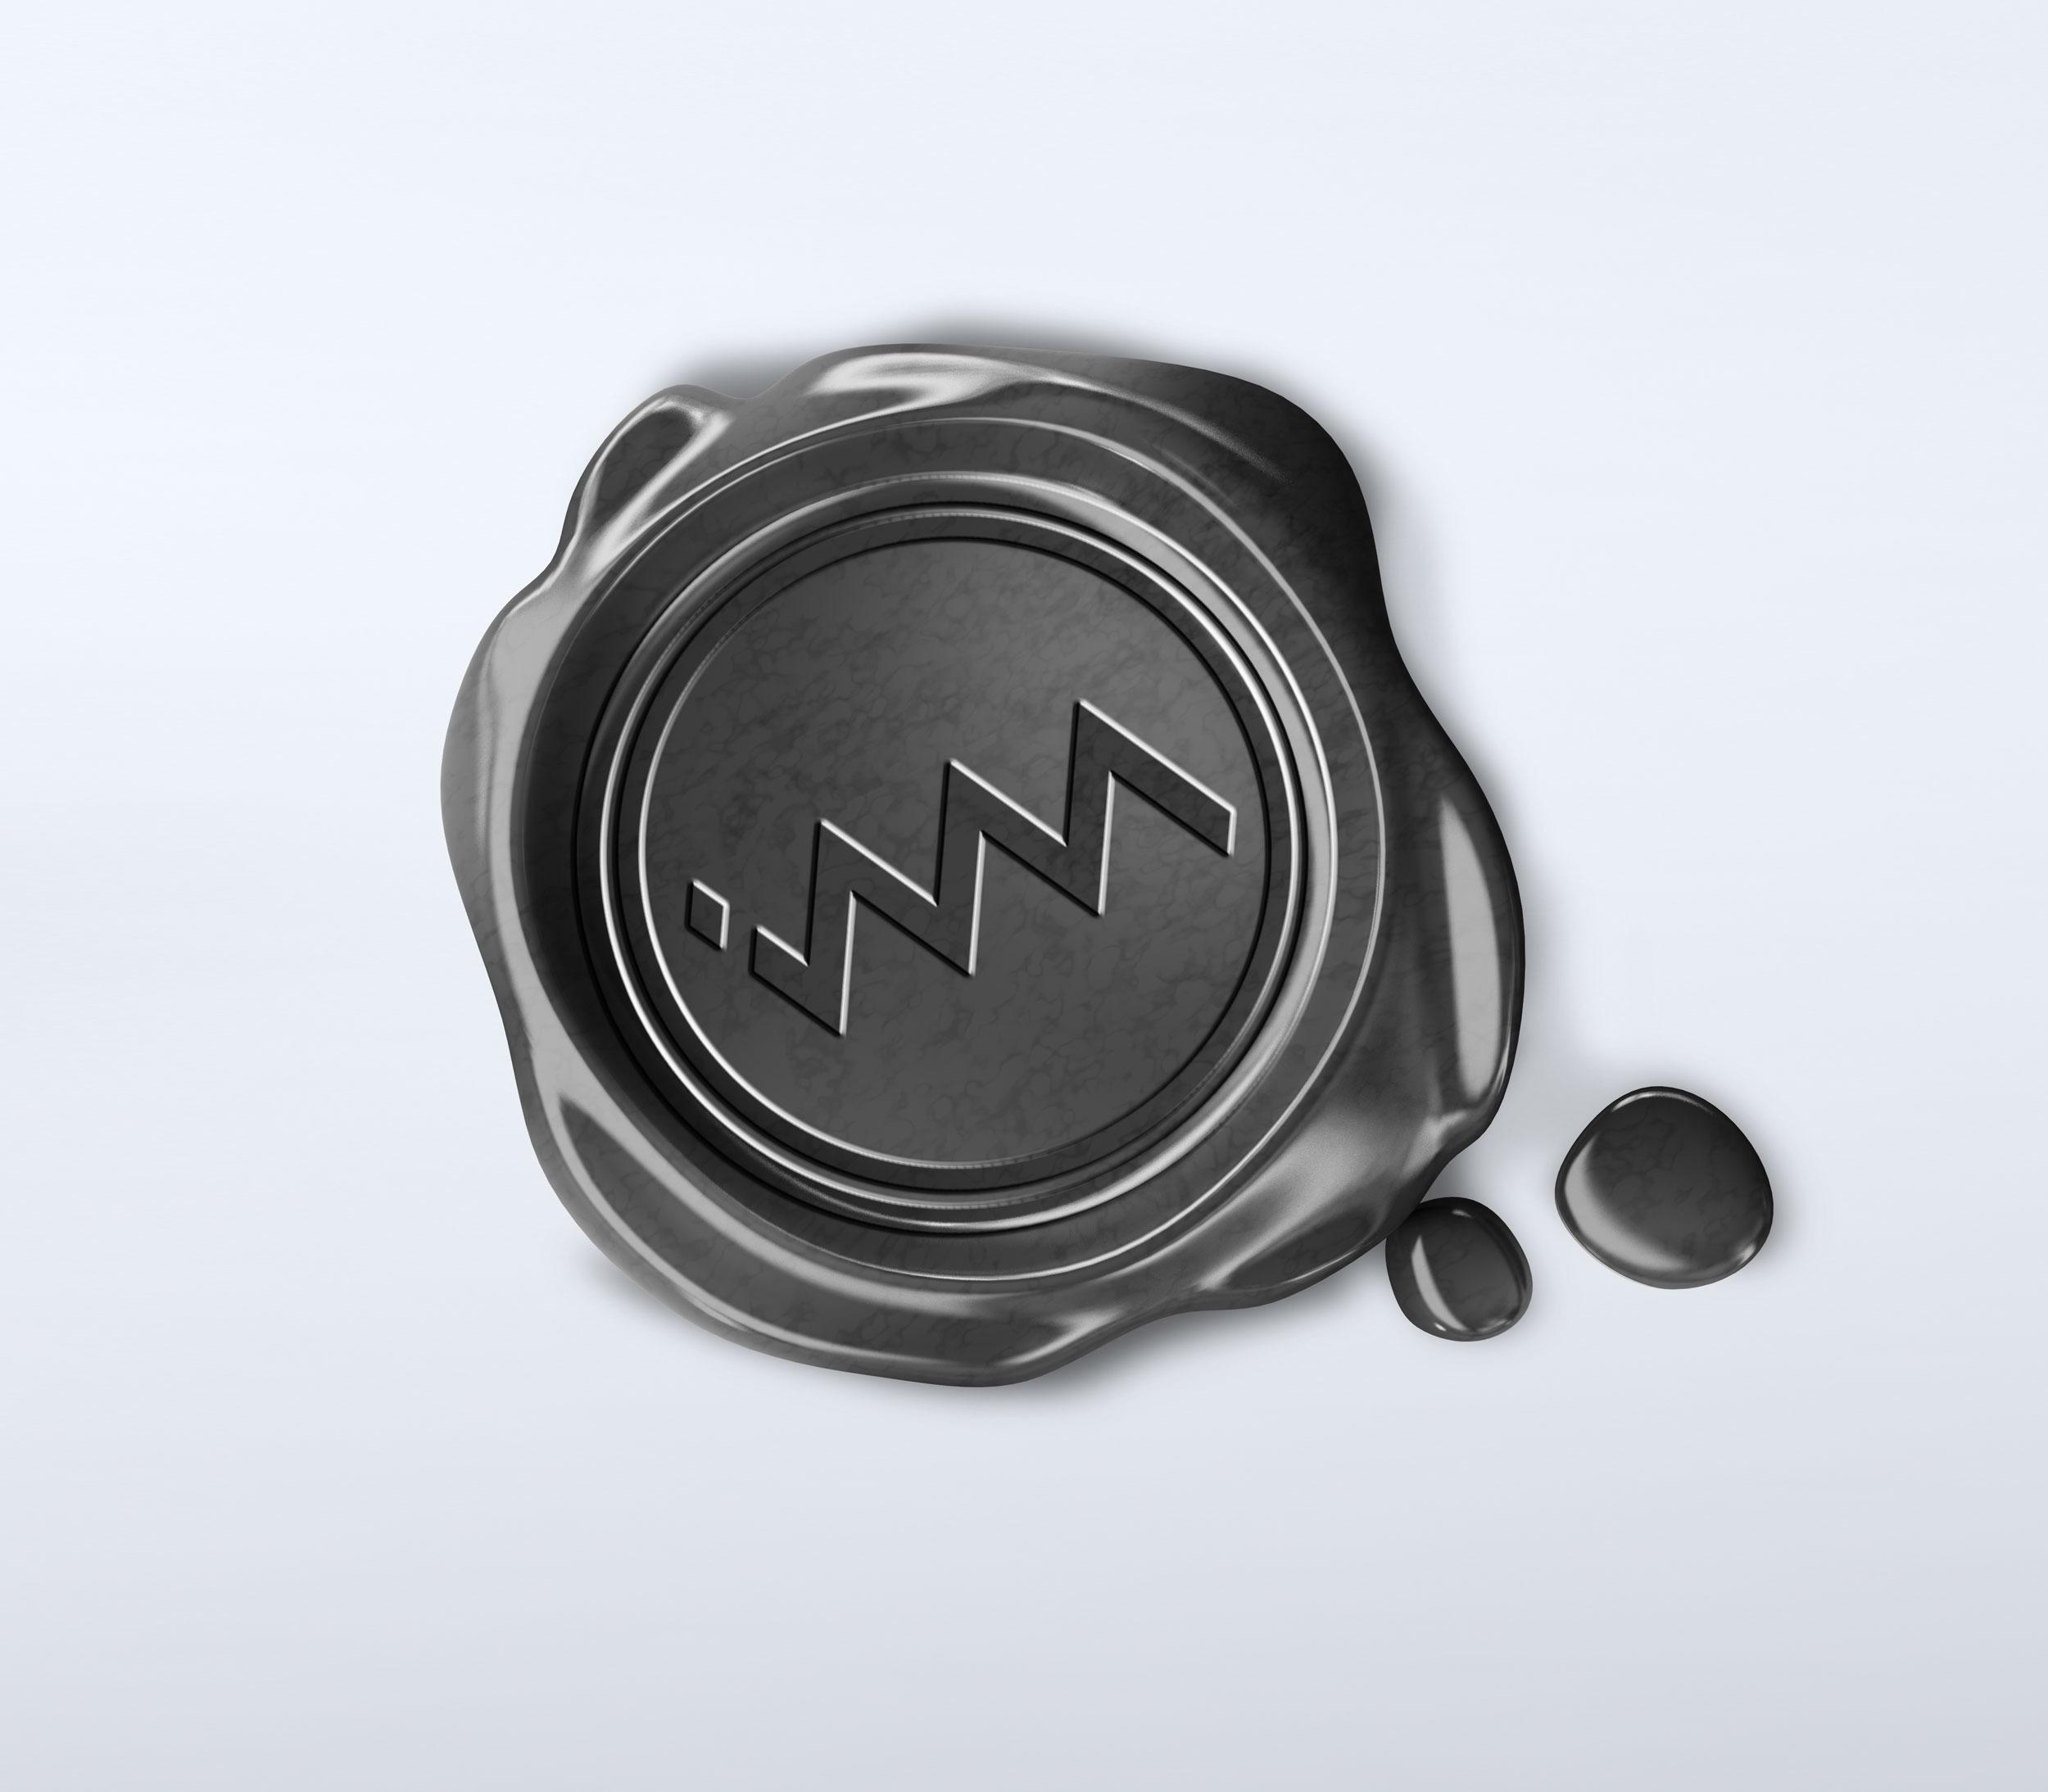 /var/www/html/wp-content/uploads/2018/11/02-Wax-Seal-Mock-Up